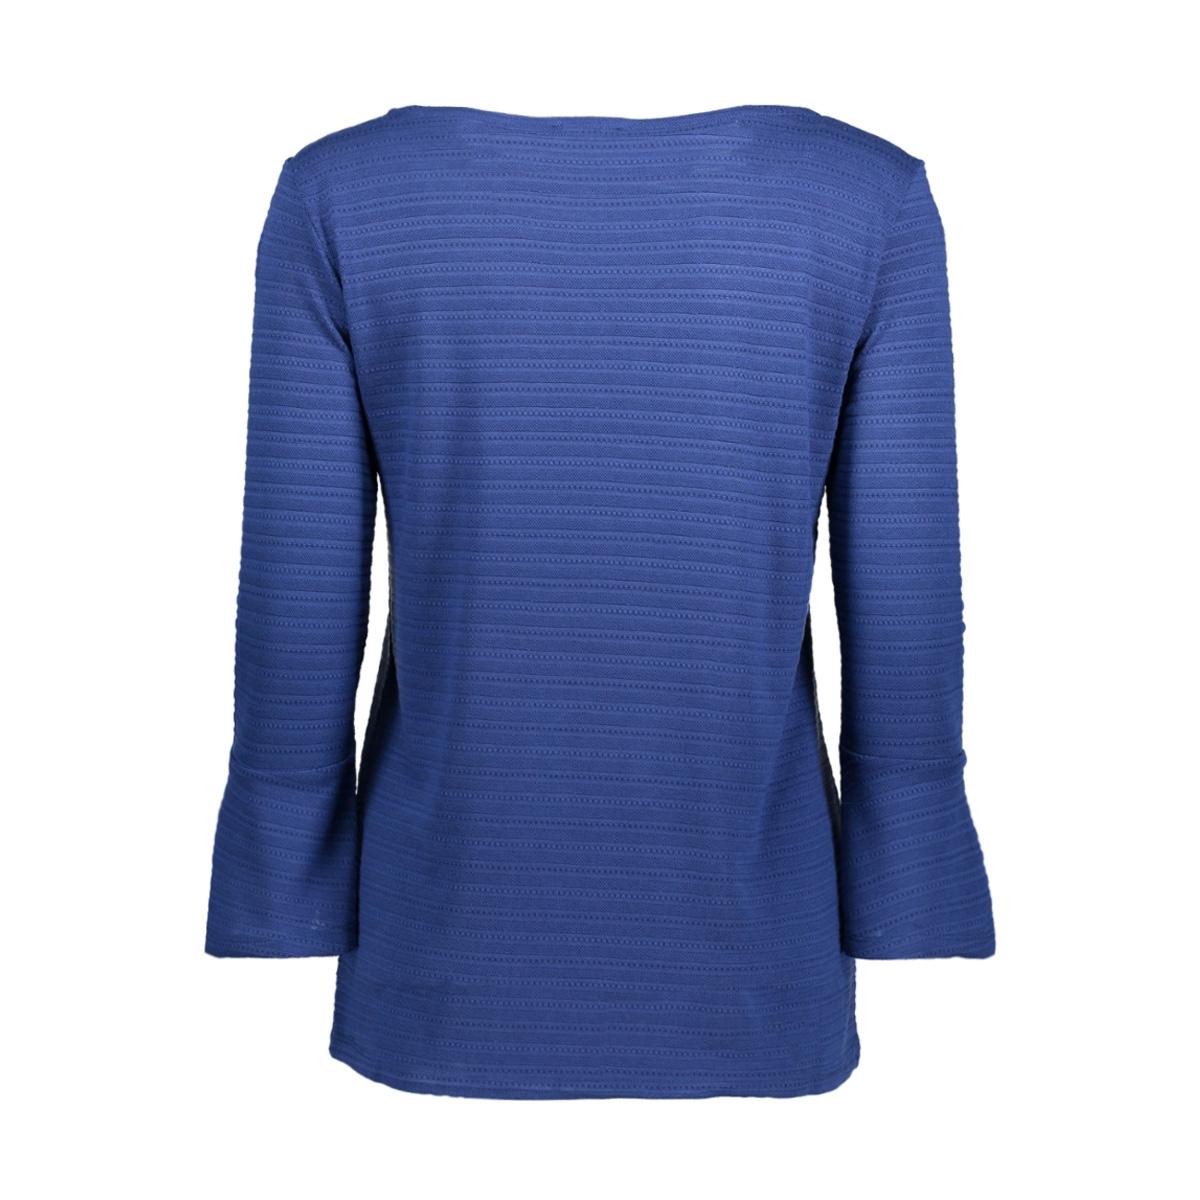 1039012.00.70 tom tailor t-shirt 6783